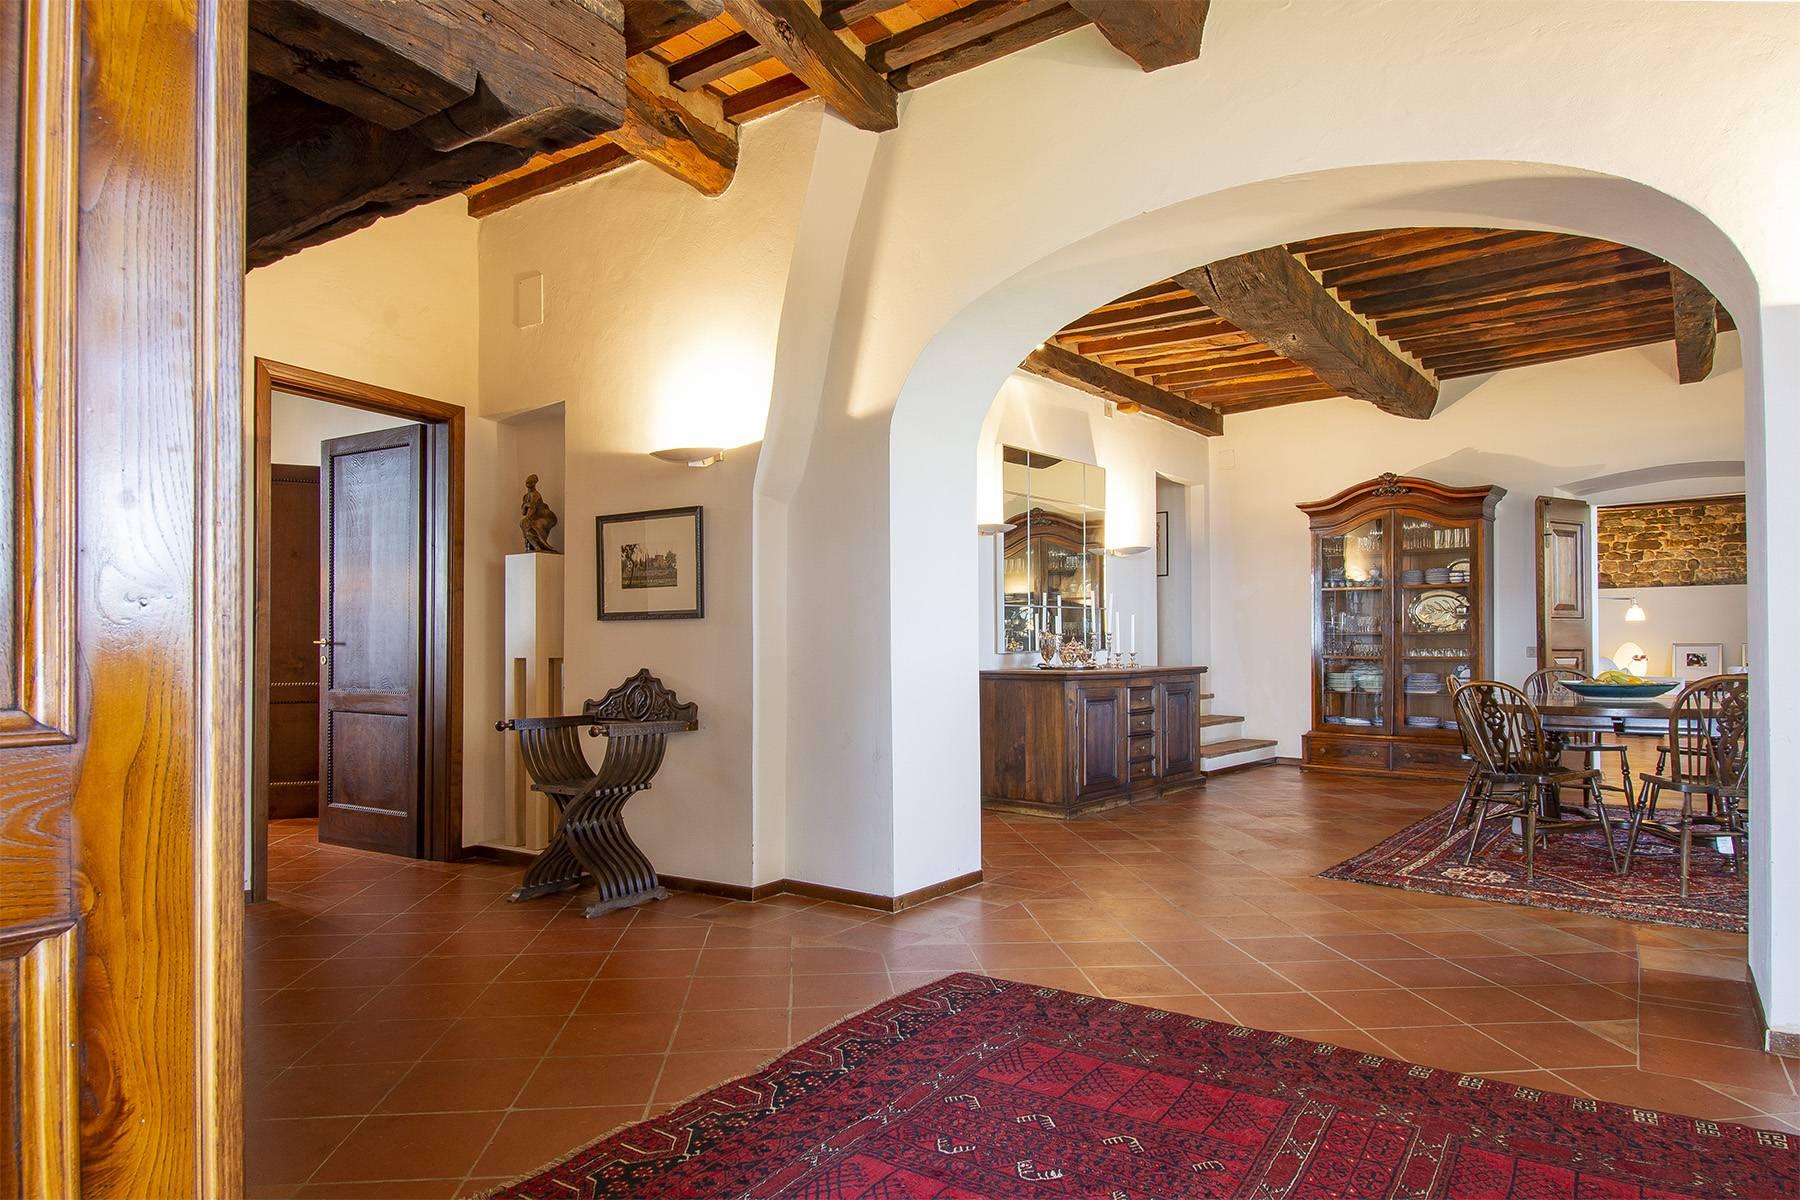 Villa in Vendita a Capannori: 5 locali, 380 mq - Foto 11